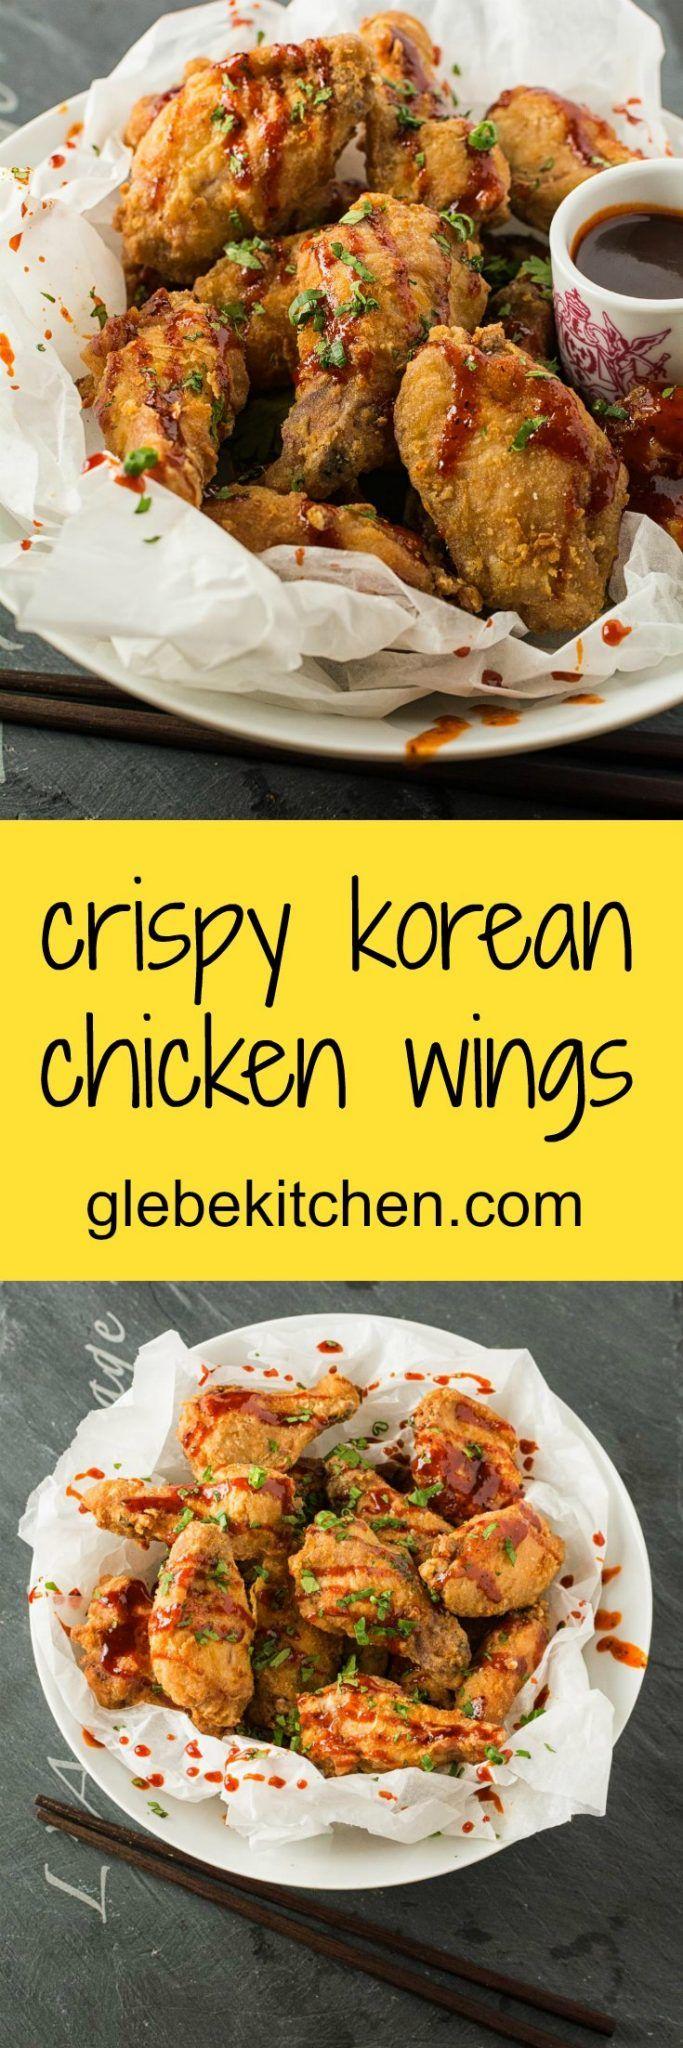 Best 25 korean bbq sauce ideas on pinterest korean bbq marinade indian restaurant lamb curry korean bbq saucekorean food recipesbbq forumfinder Choice Image